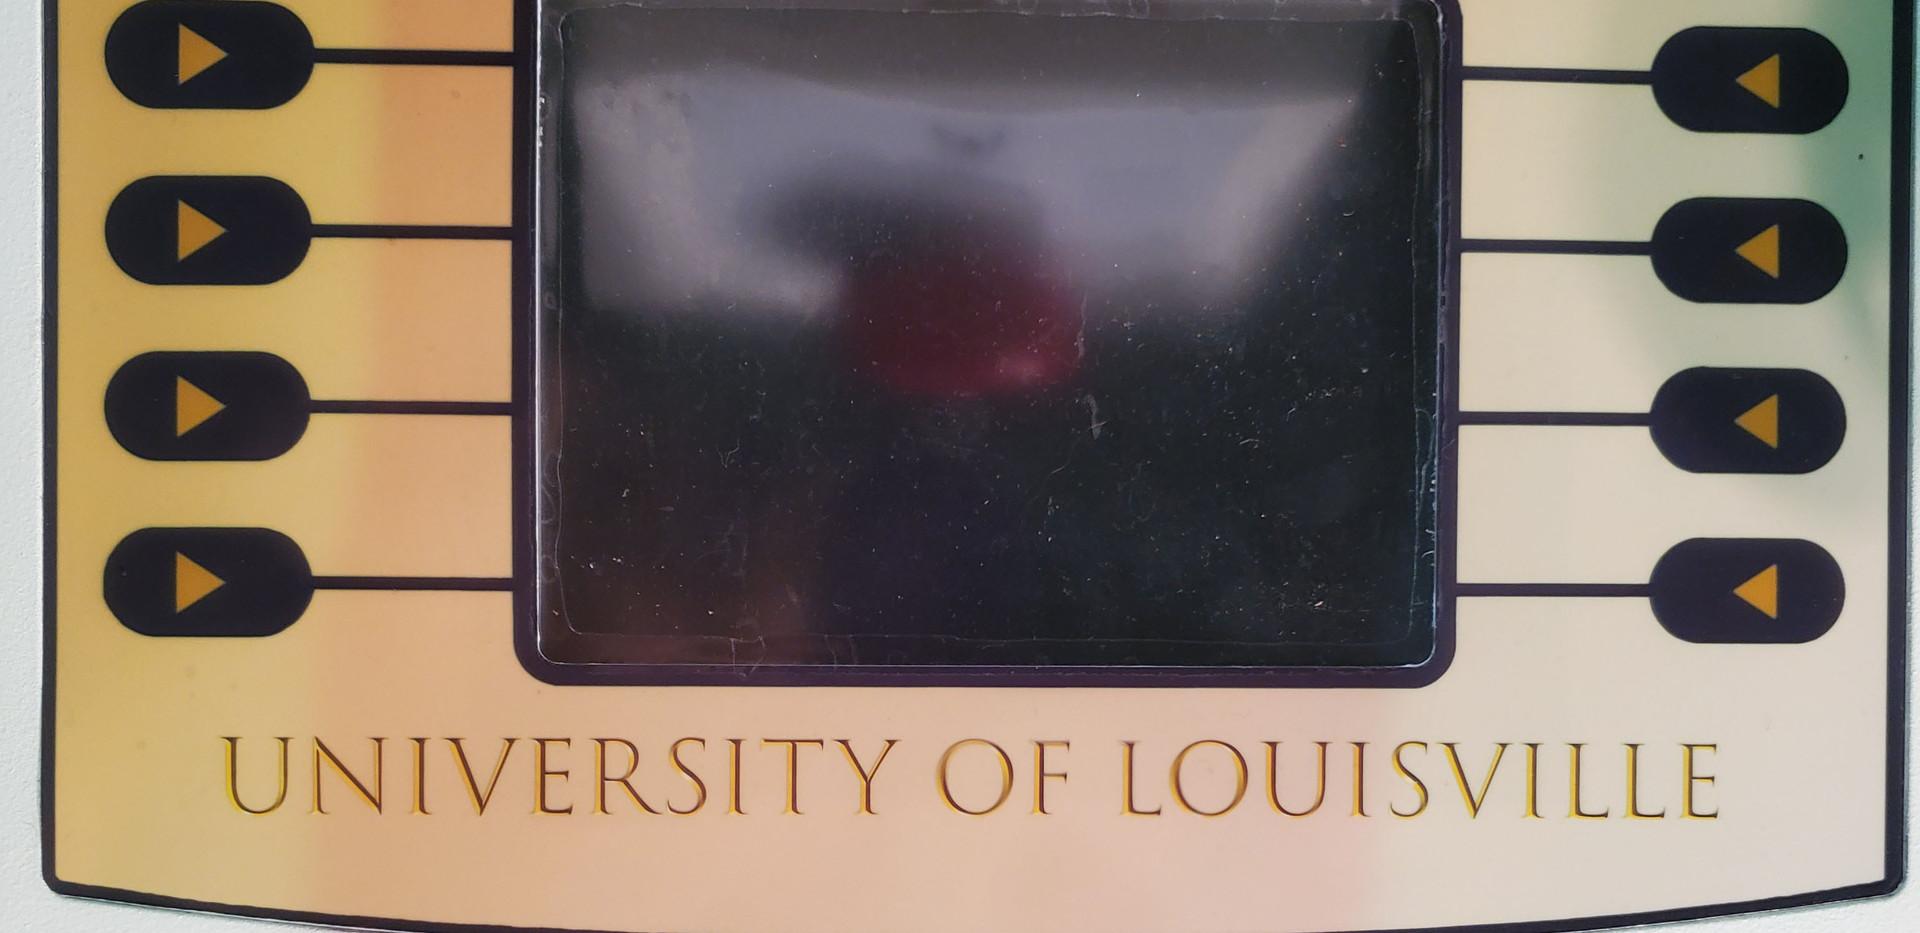 University of Louisville Custom C-Arm Build